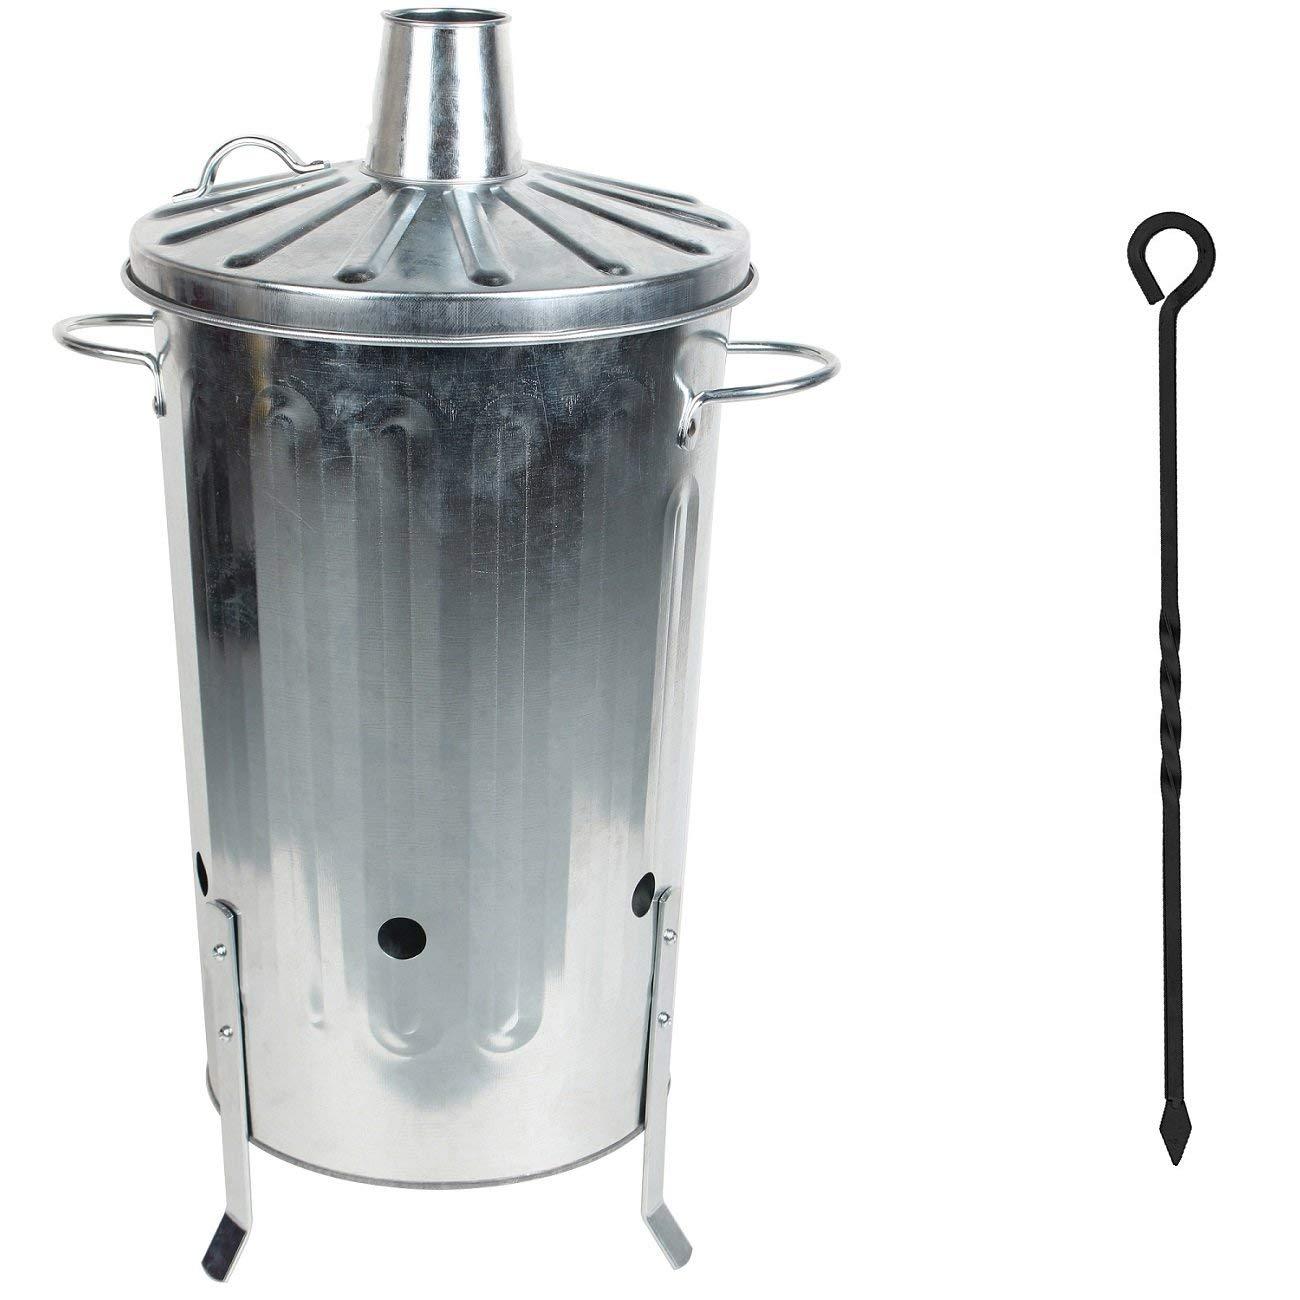 CrazyGadget® 18 Litre 18L Small Garden Galvanised Metal Incinerator Fire Burning Bin for Wood Paper Leaves + Free Ash Poker